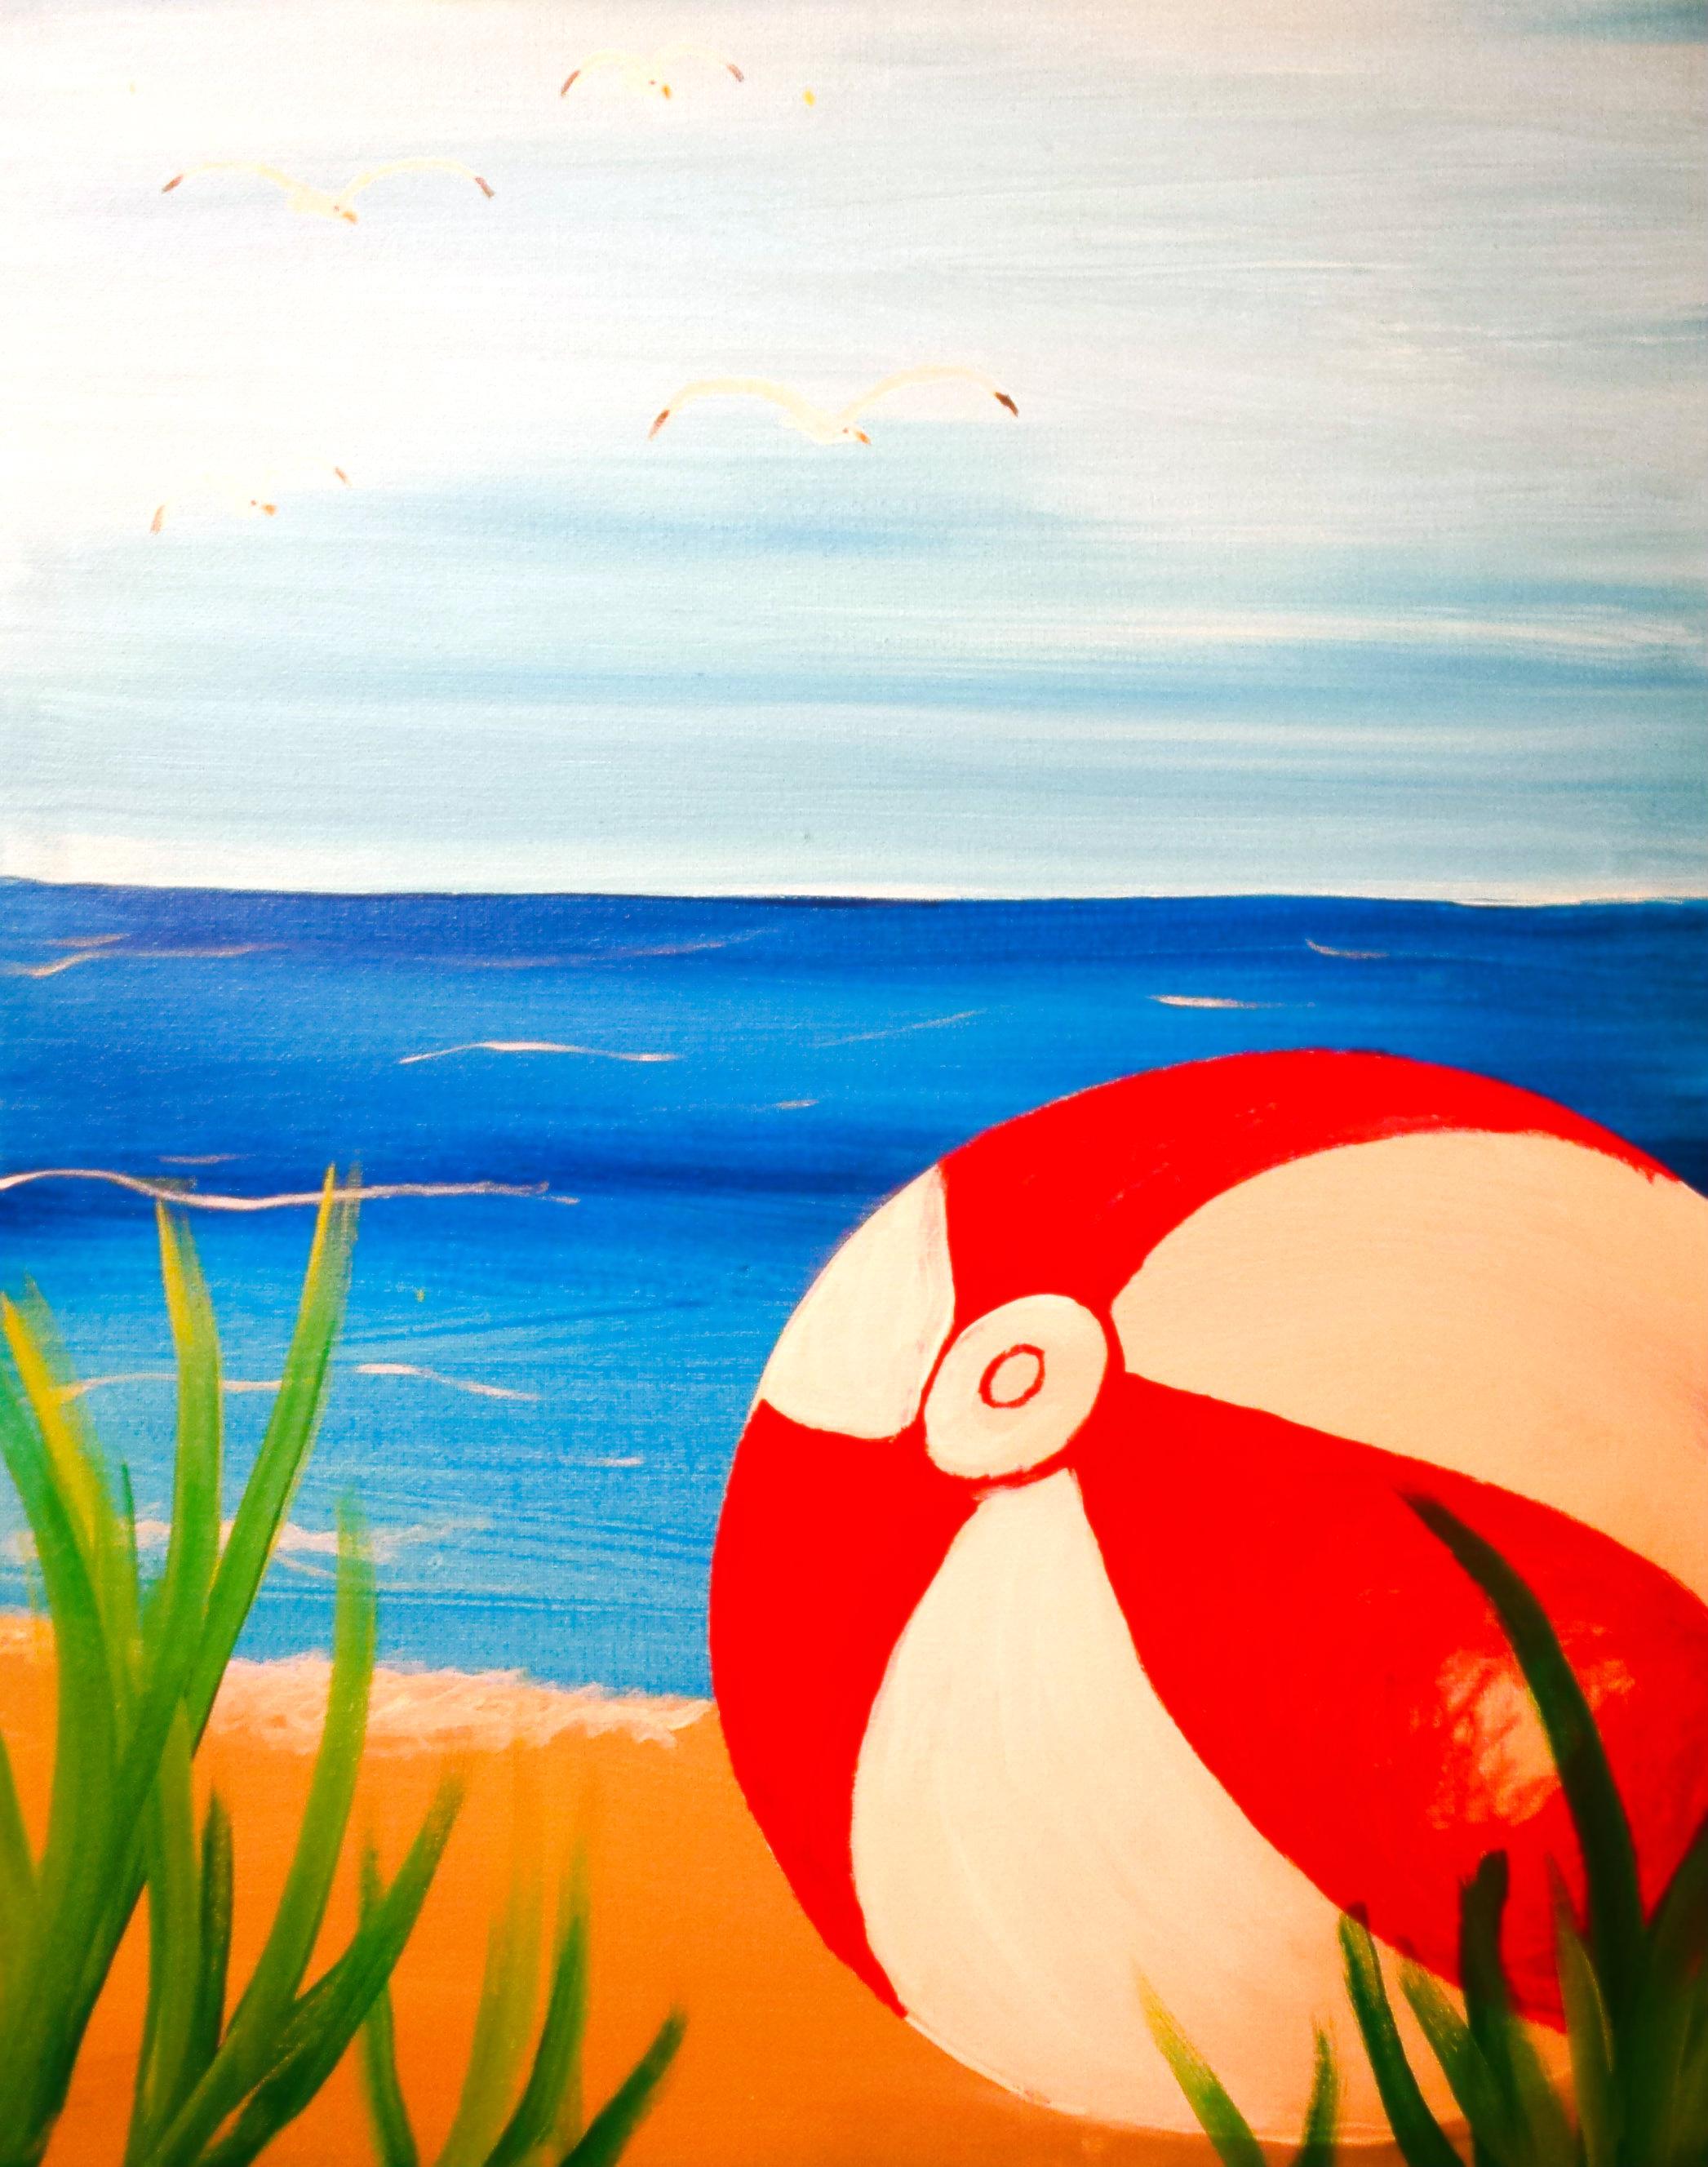 BEACH BALL By Melanie Atesalp